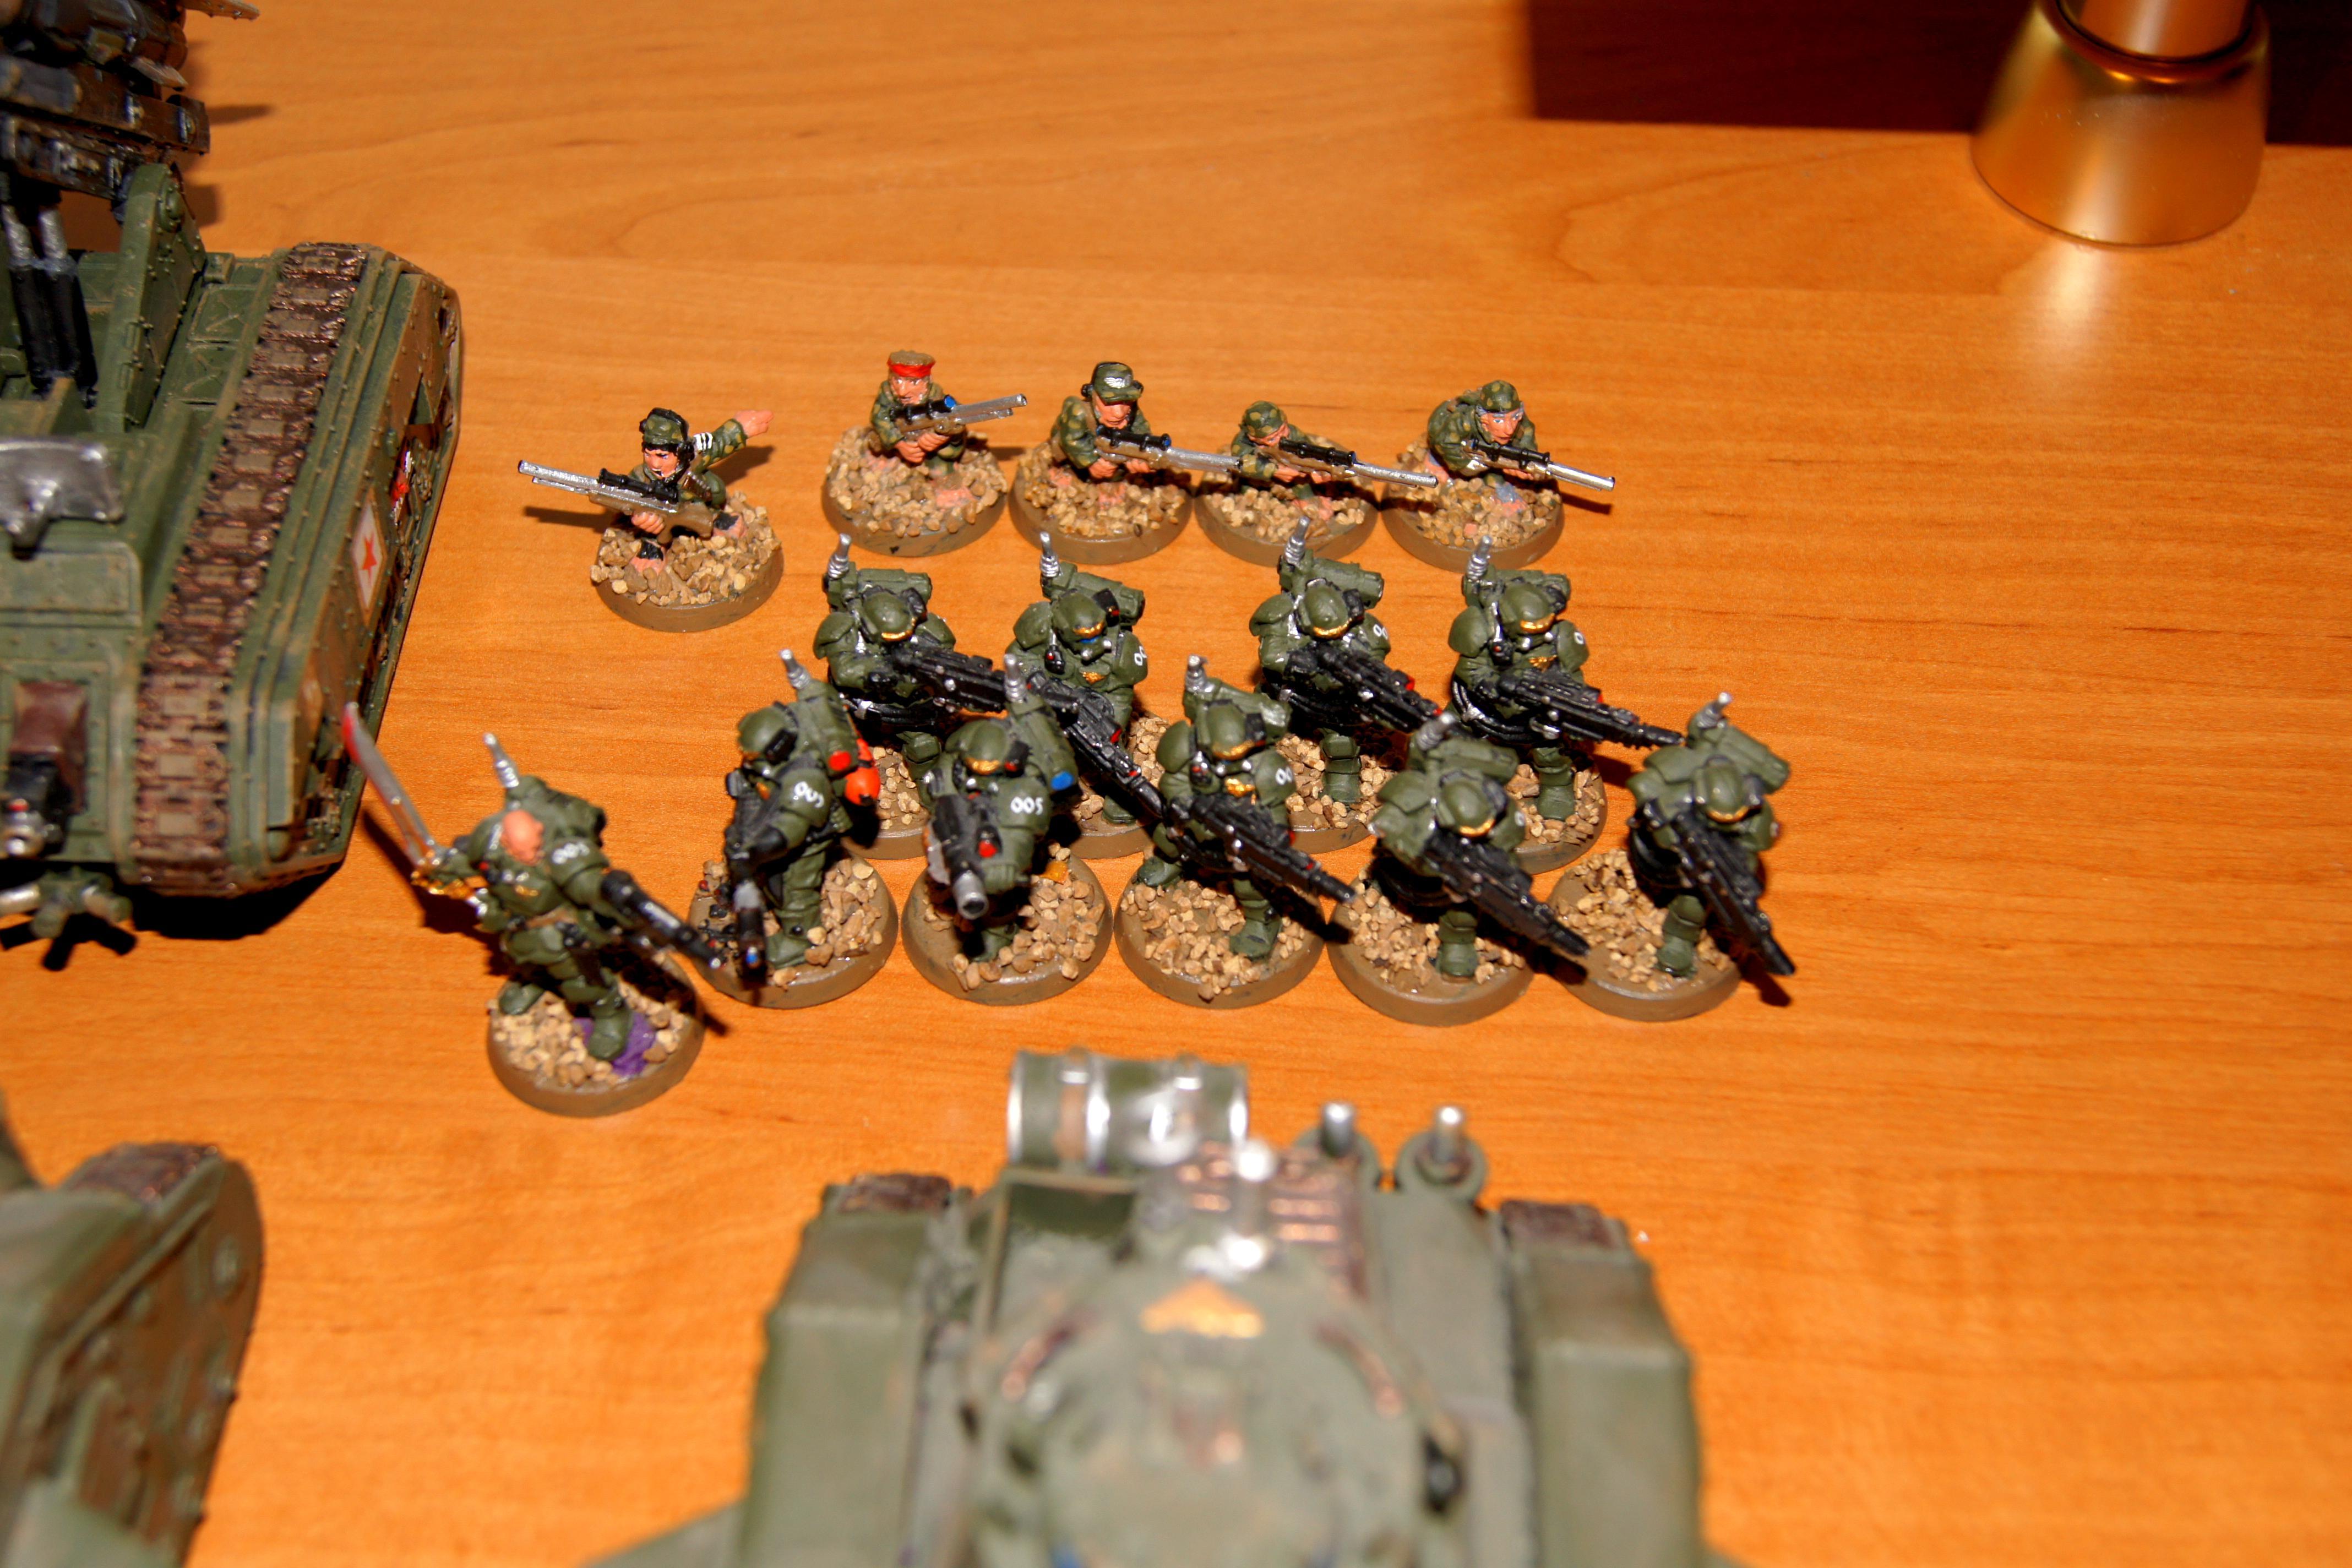 Army, Astra Militarum, Conversion, Deathstrike, Demolisher, Heavy Weapon, Imperial Guard, Leman Russ, Militarum Tempestus, Ratlings, Storm Troopers, Tempestus Scions, Veteran